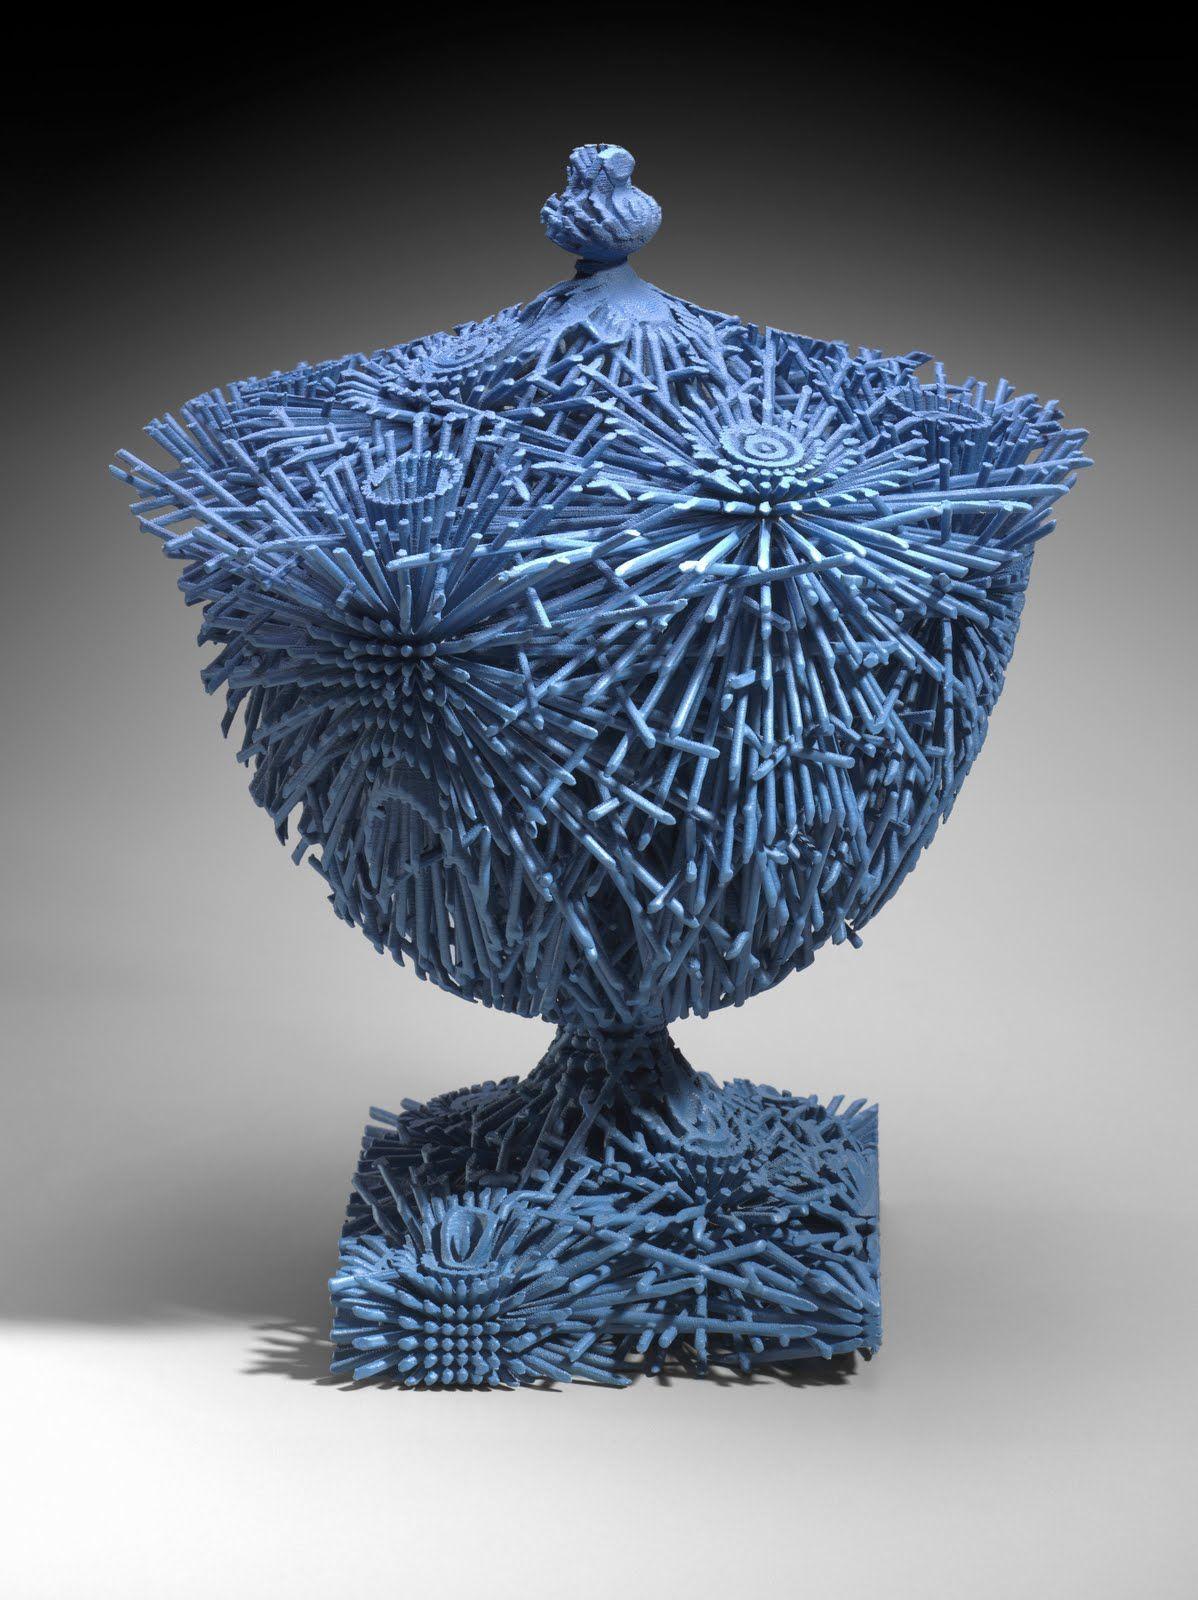 Ceramics michael eden artist bloom 2010 made by